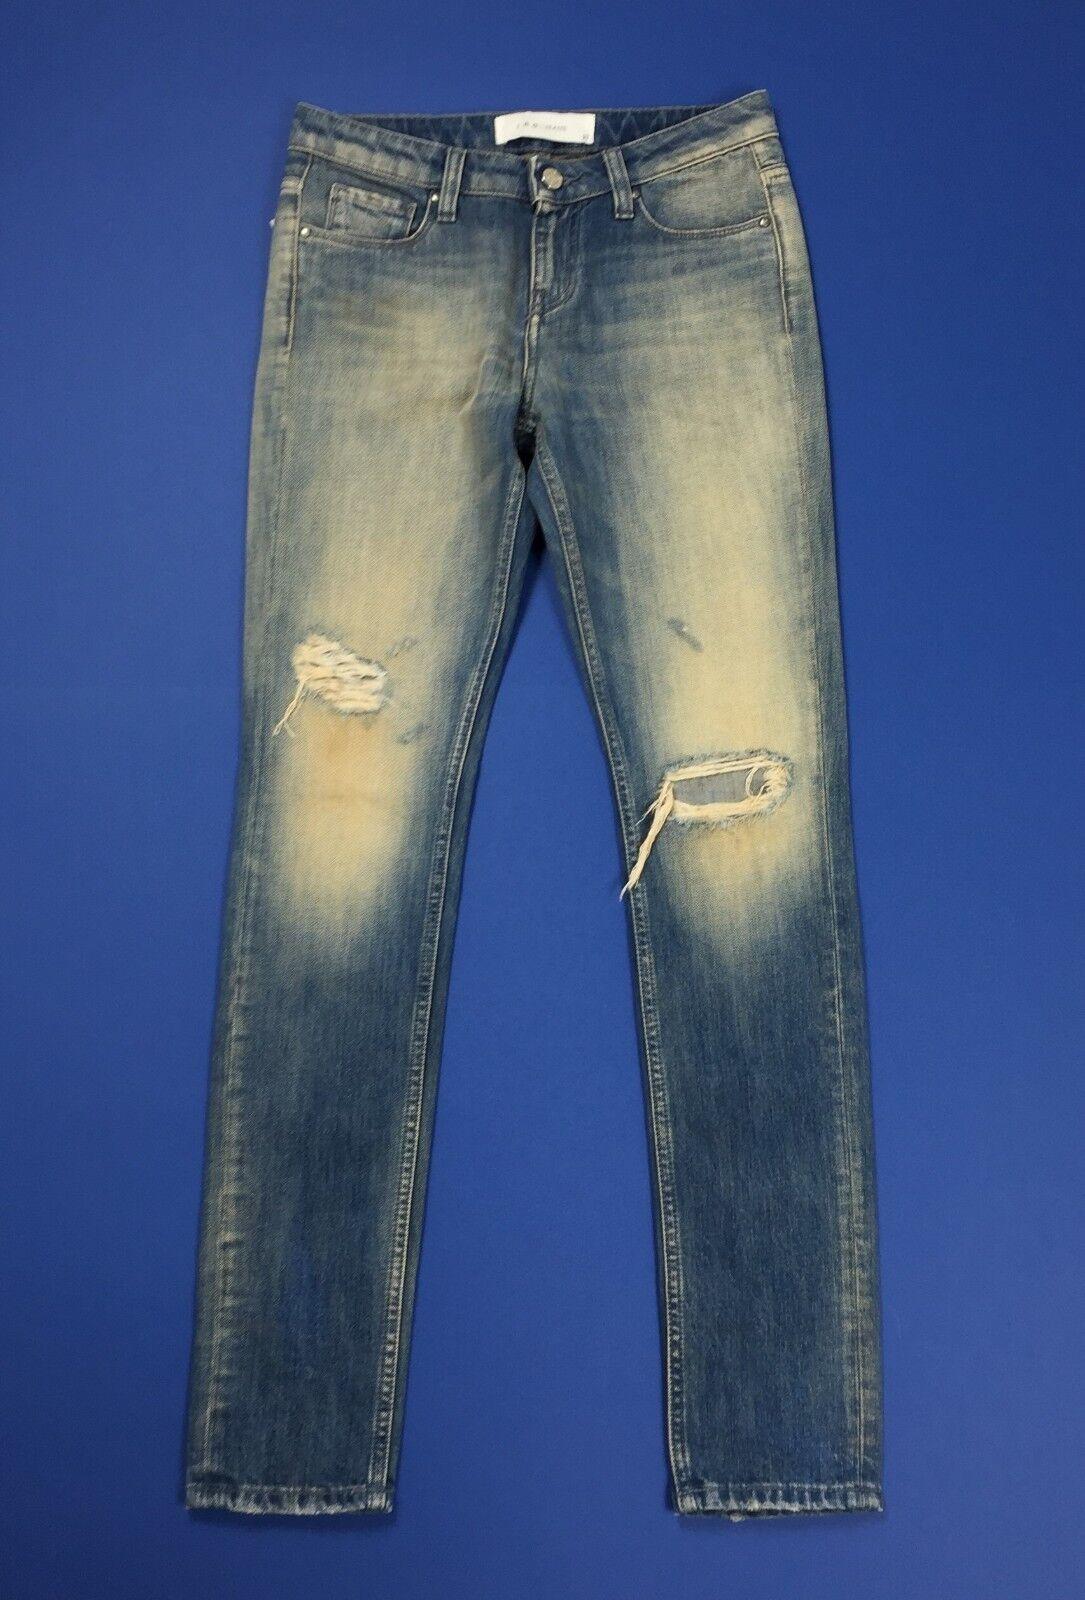 Iro jeans donna nuovo skinny stretch destroyed w27 tg 41 hot mom luxury T4228